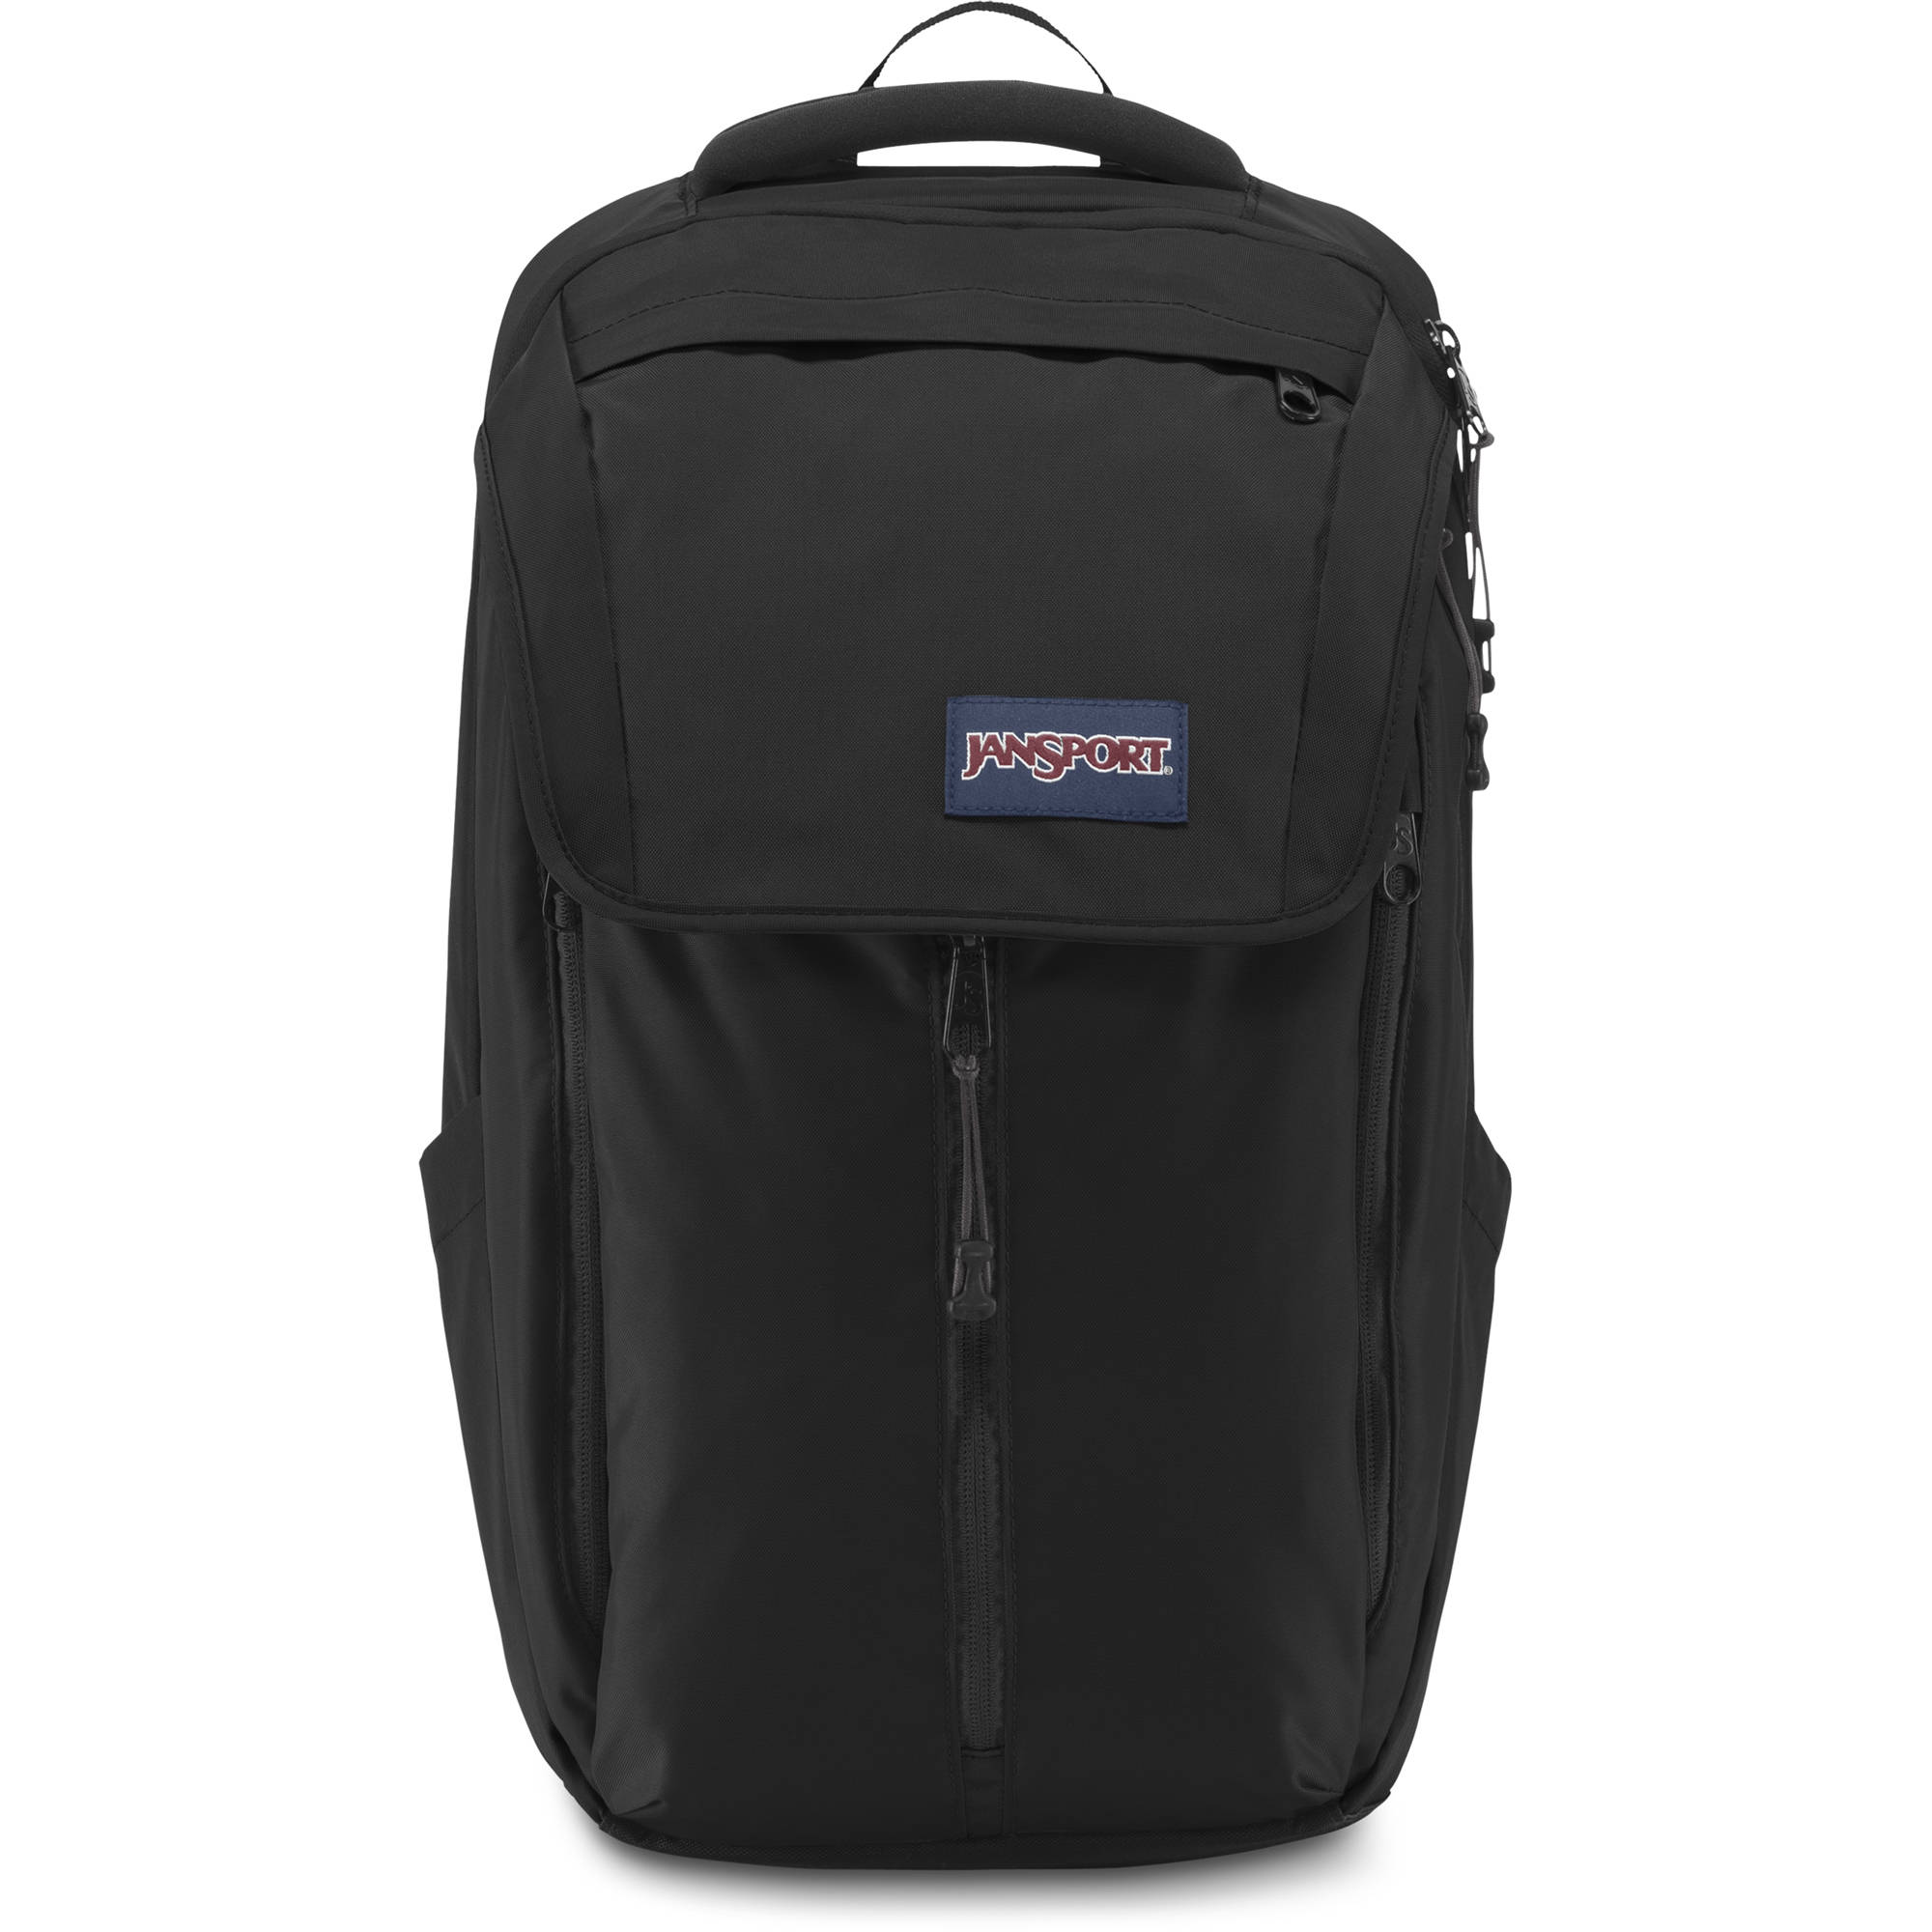 JanSport Source 26L Backpack (Black) JS00T55A008 B&H Photo Video